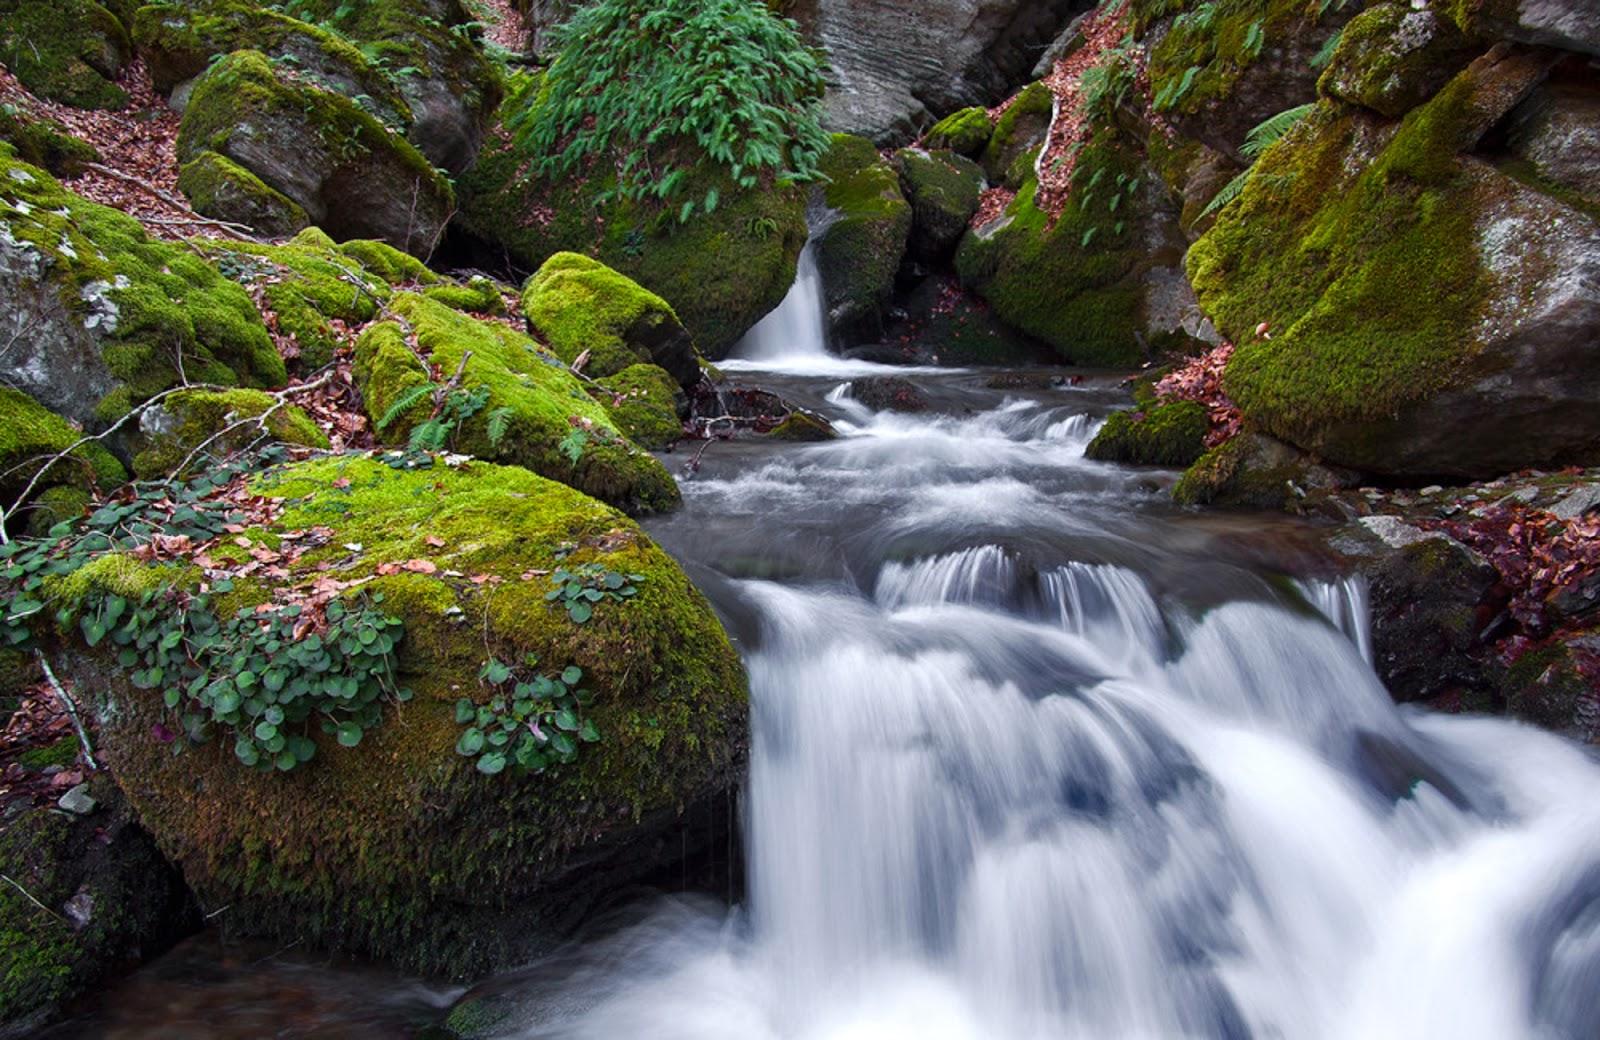 Paraísos terrenales | Fotos de naturaleza, animales, paisajes